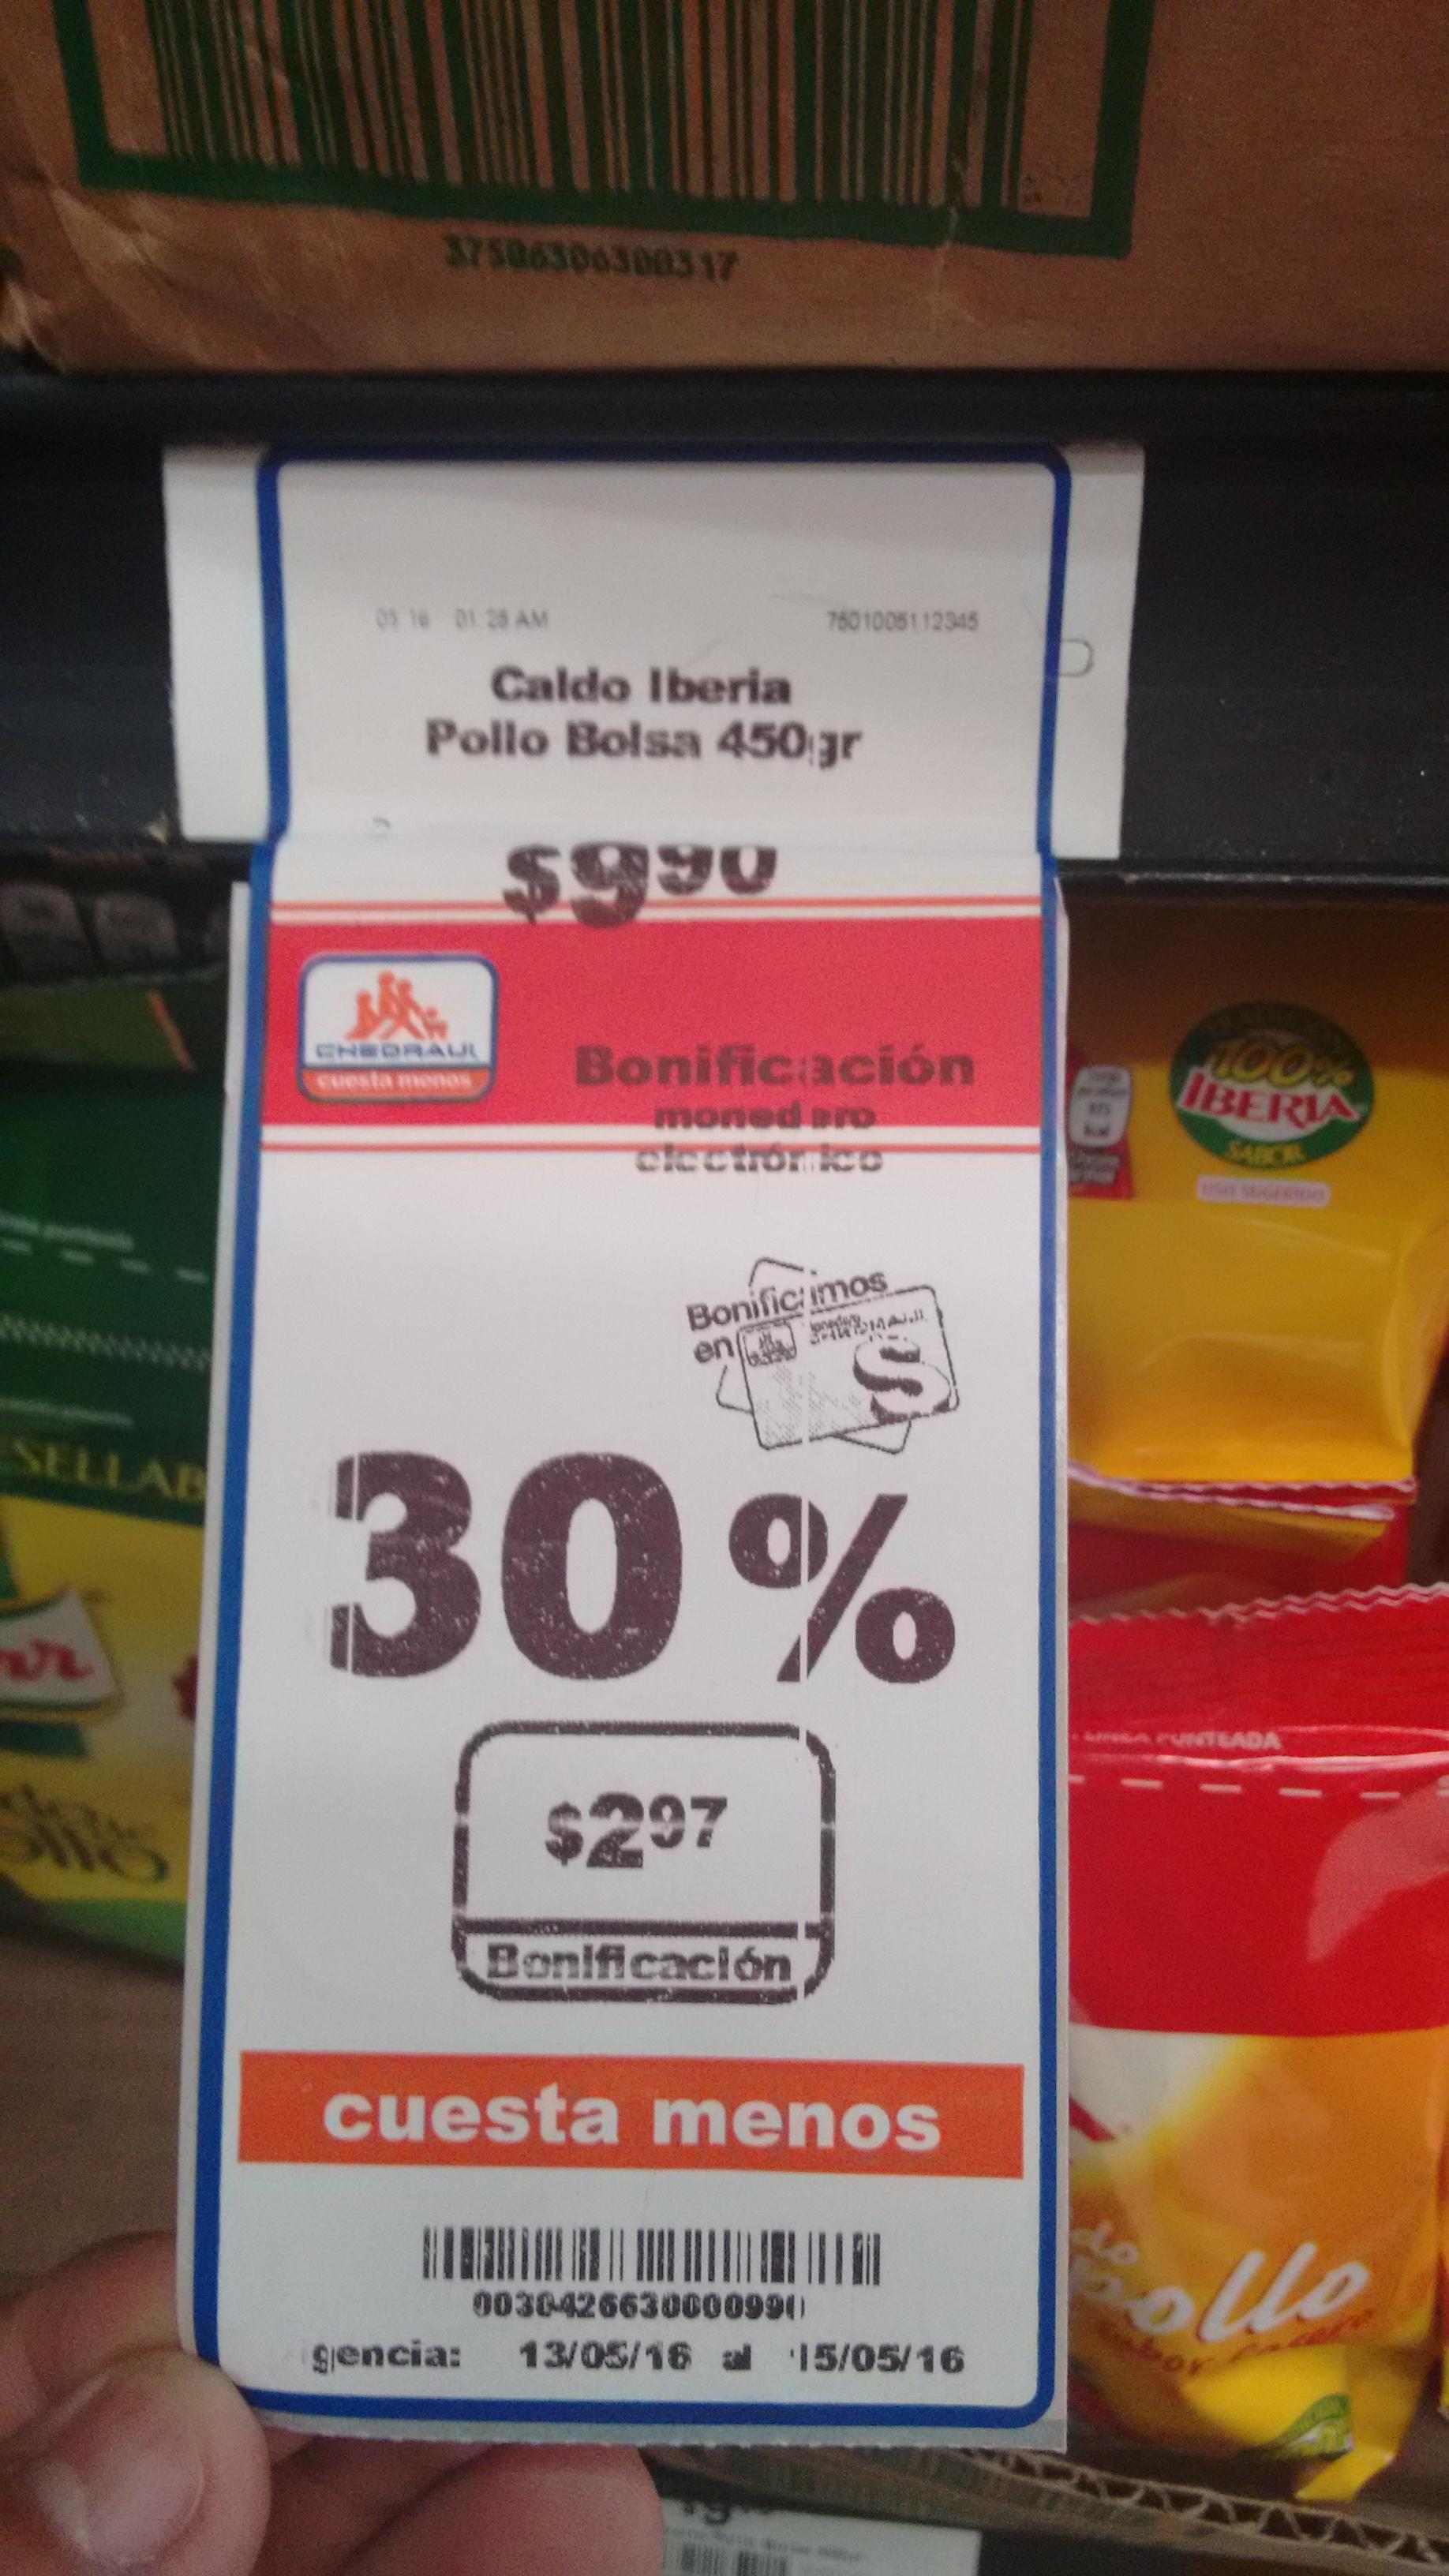 Chedraui Tenayuca: Caldo Iberia Pollo Bolsa 450gr a $9.90